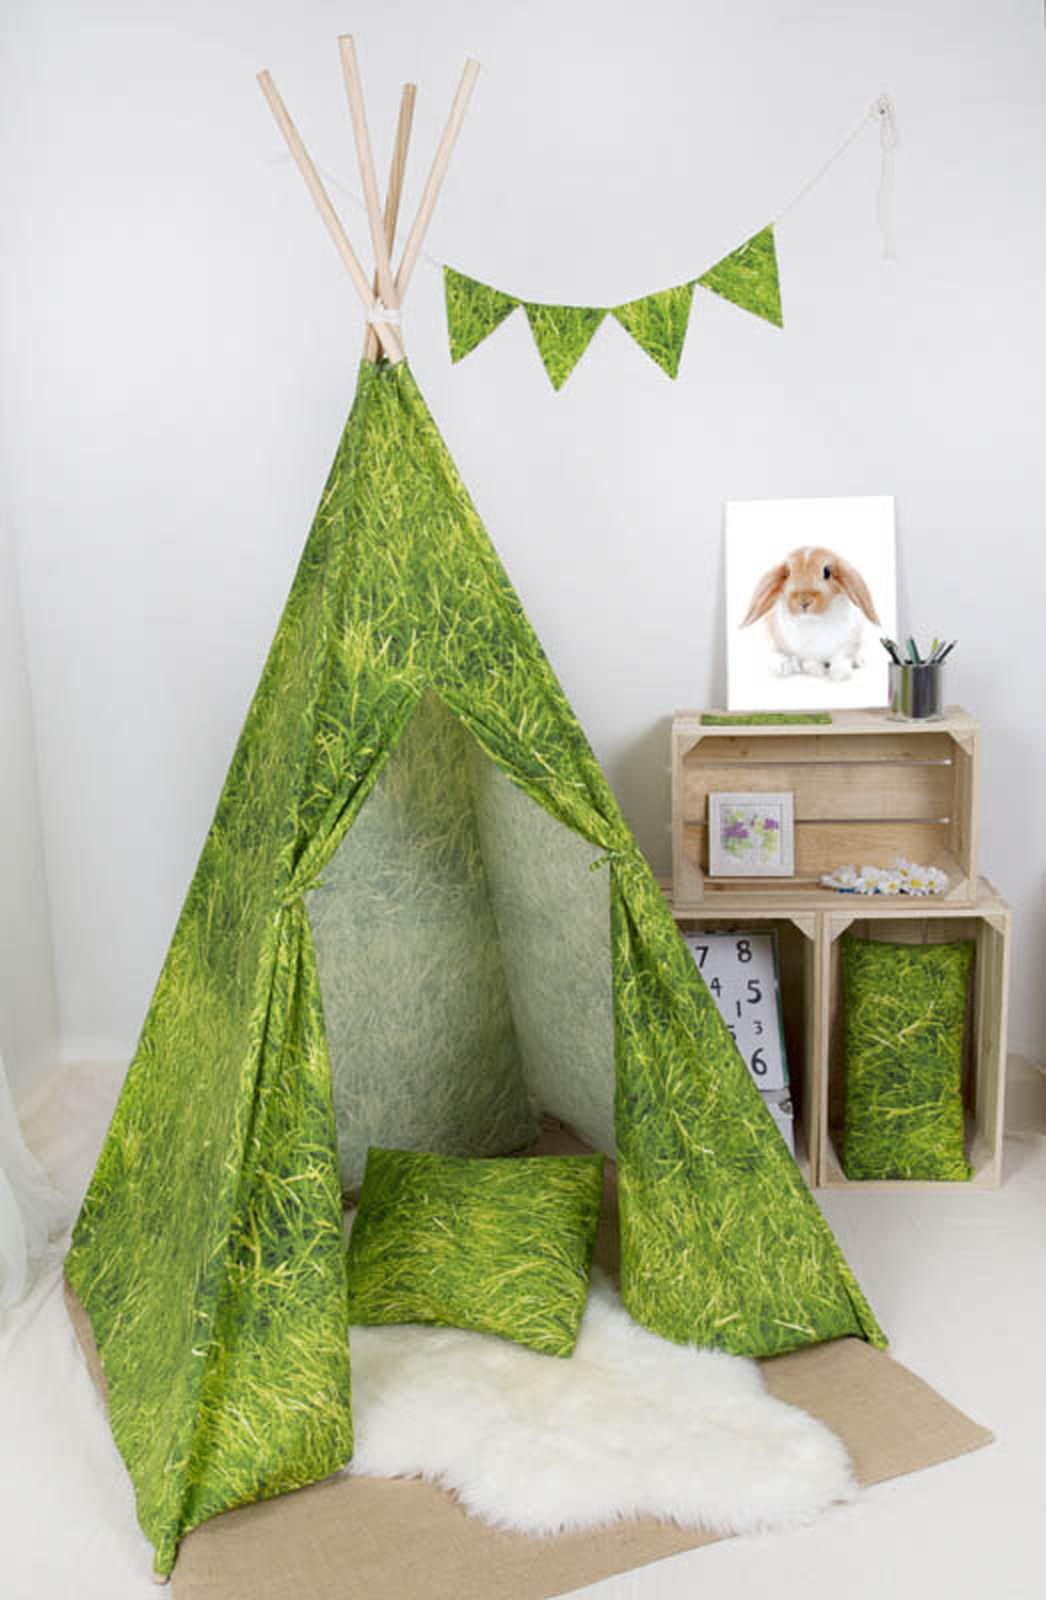 Tipis Indios para Nios  Tipis y casitas artesanales para decoracin infantil